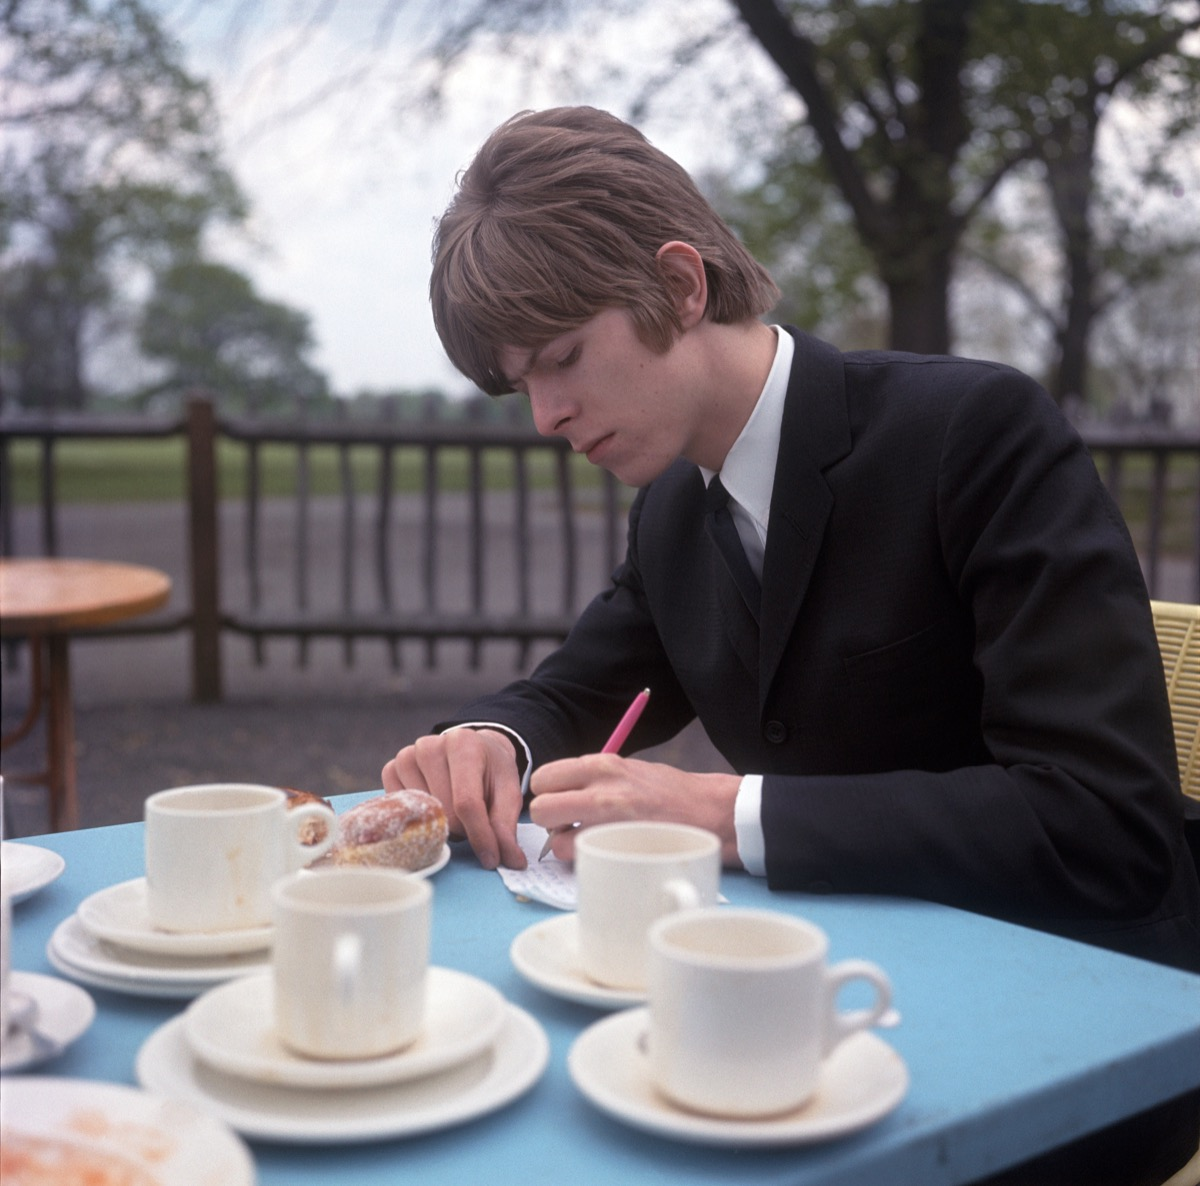 David Bowie writing lyrics in 1966